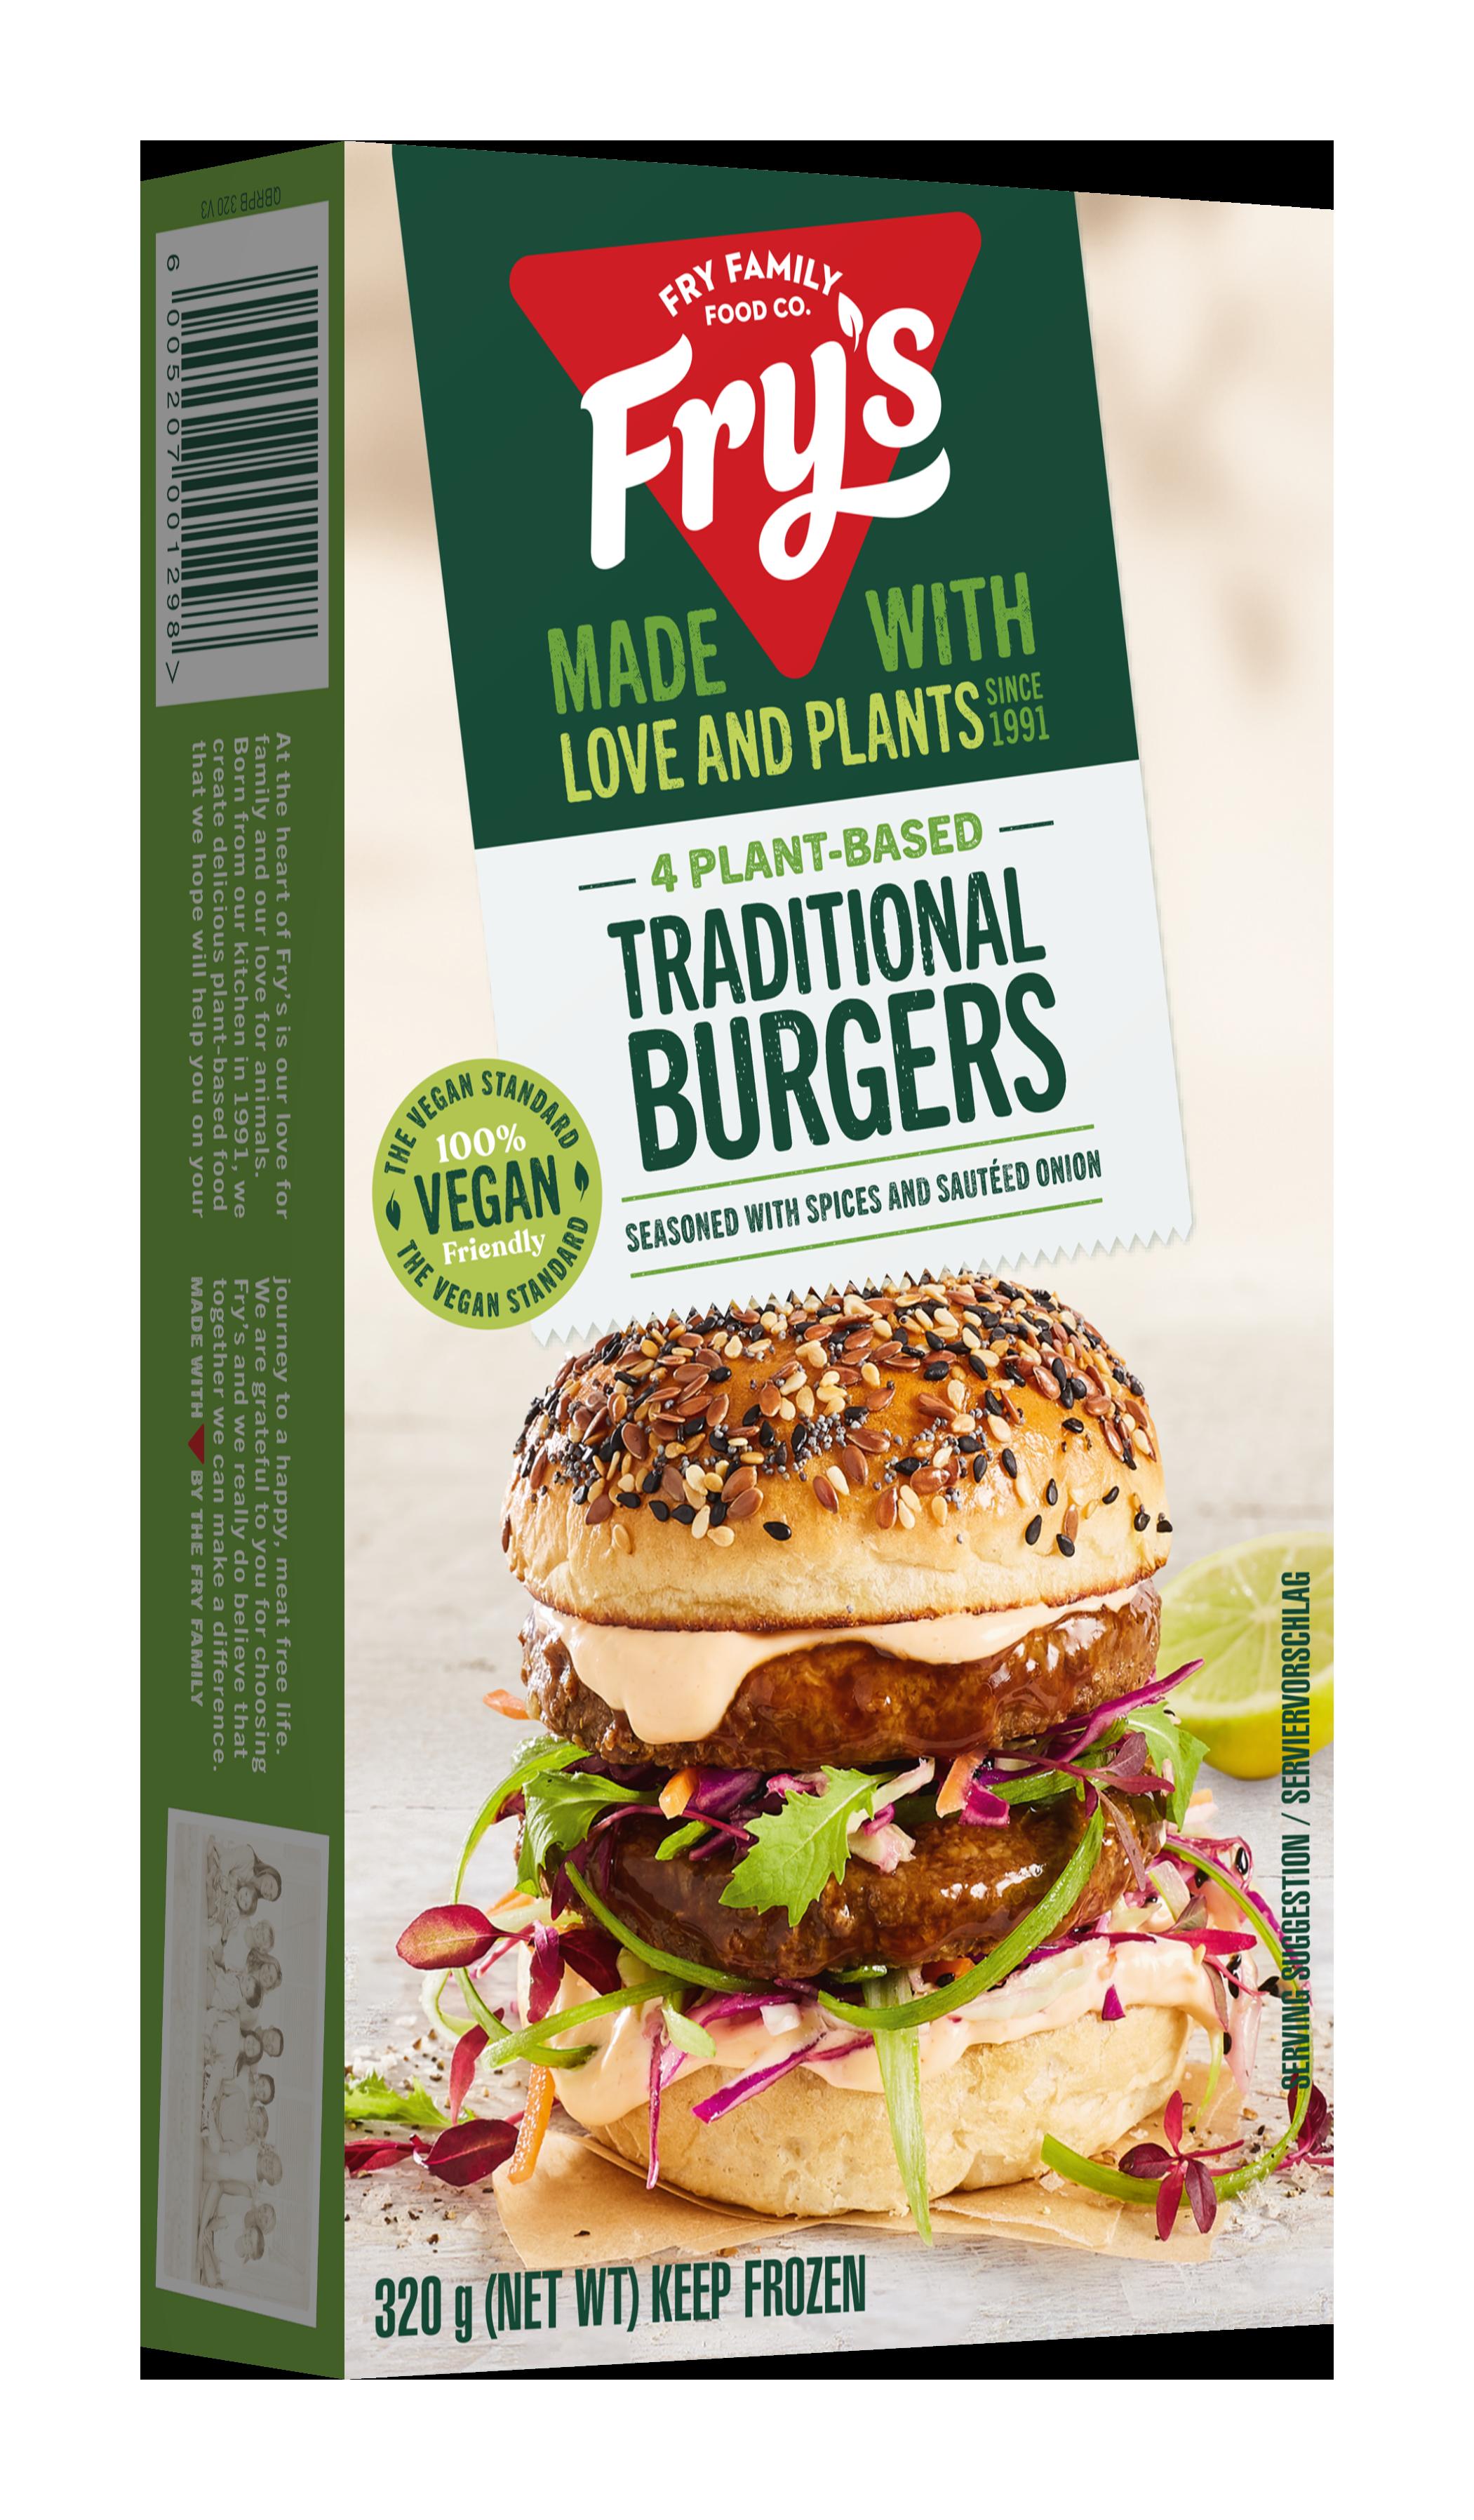 Plant-based traditional burger